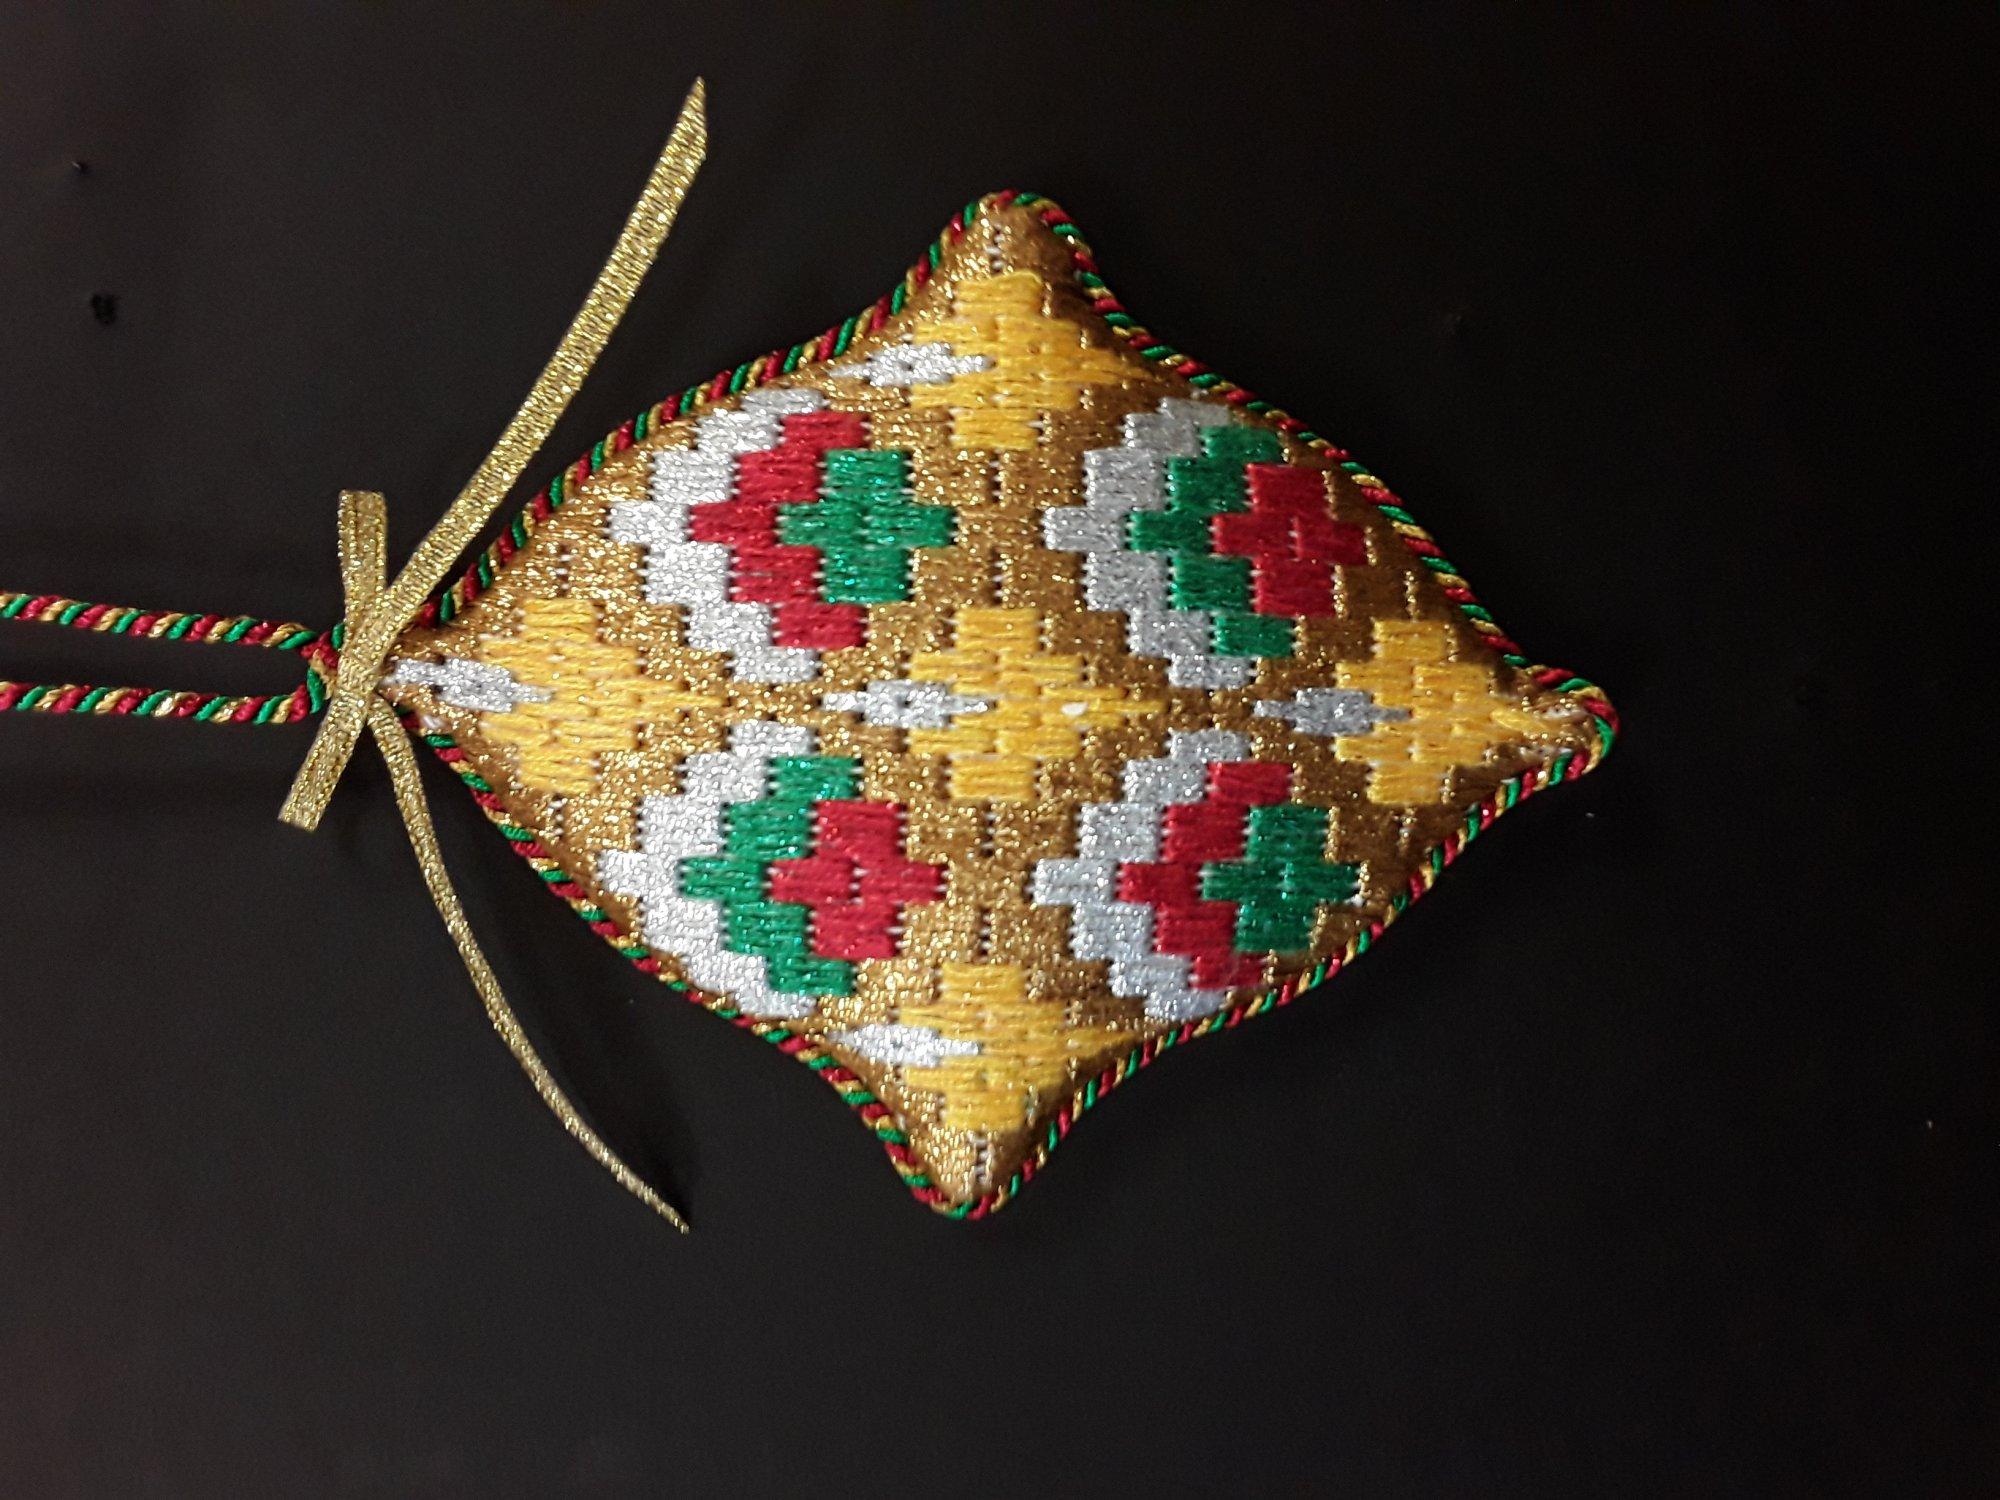 Bargello Ornament #11 - Stitched by Chuck S.